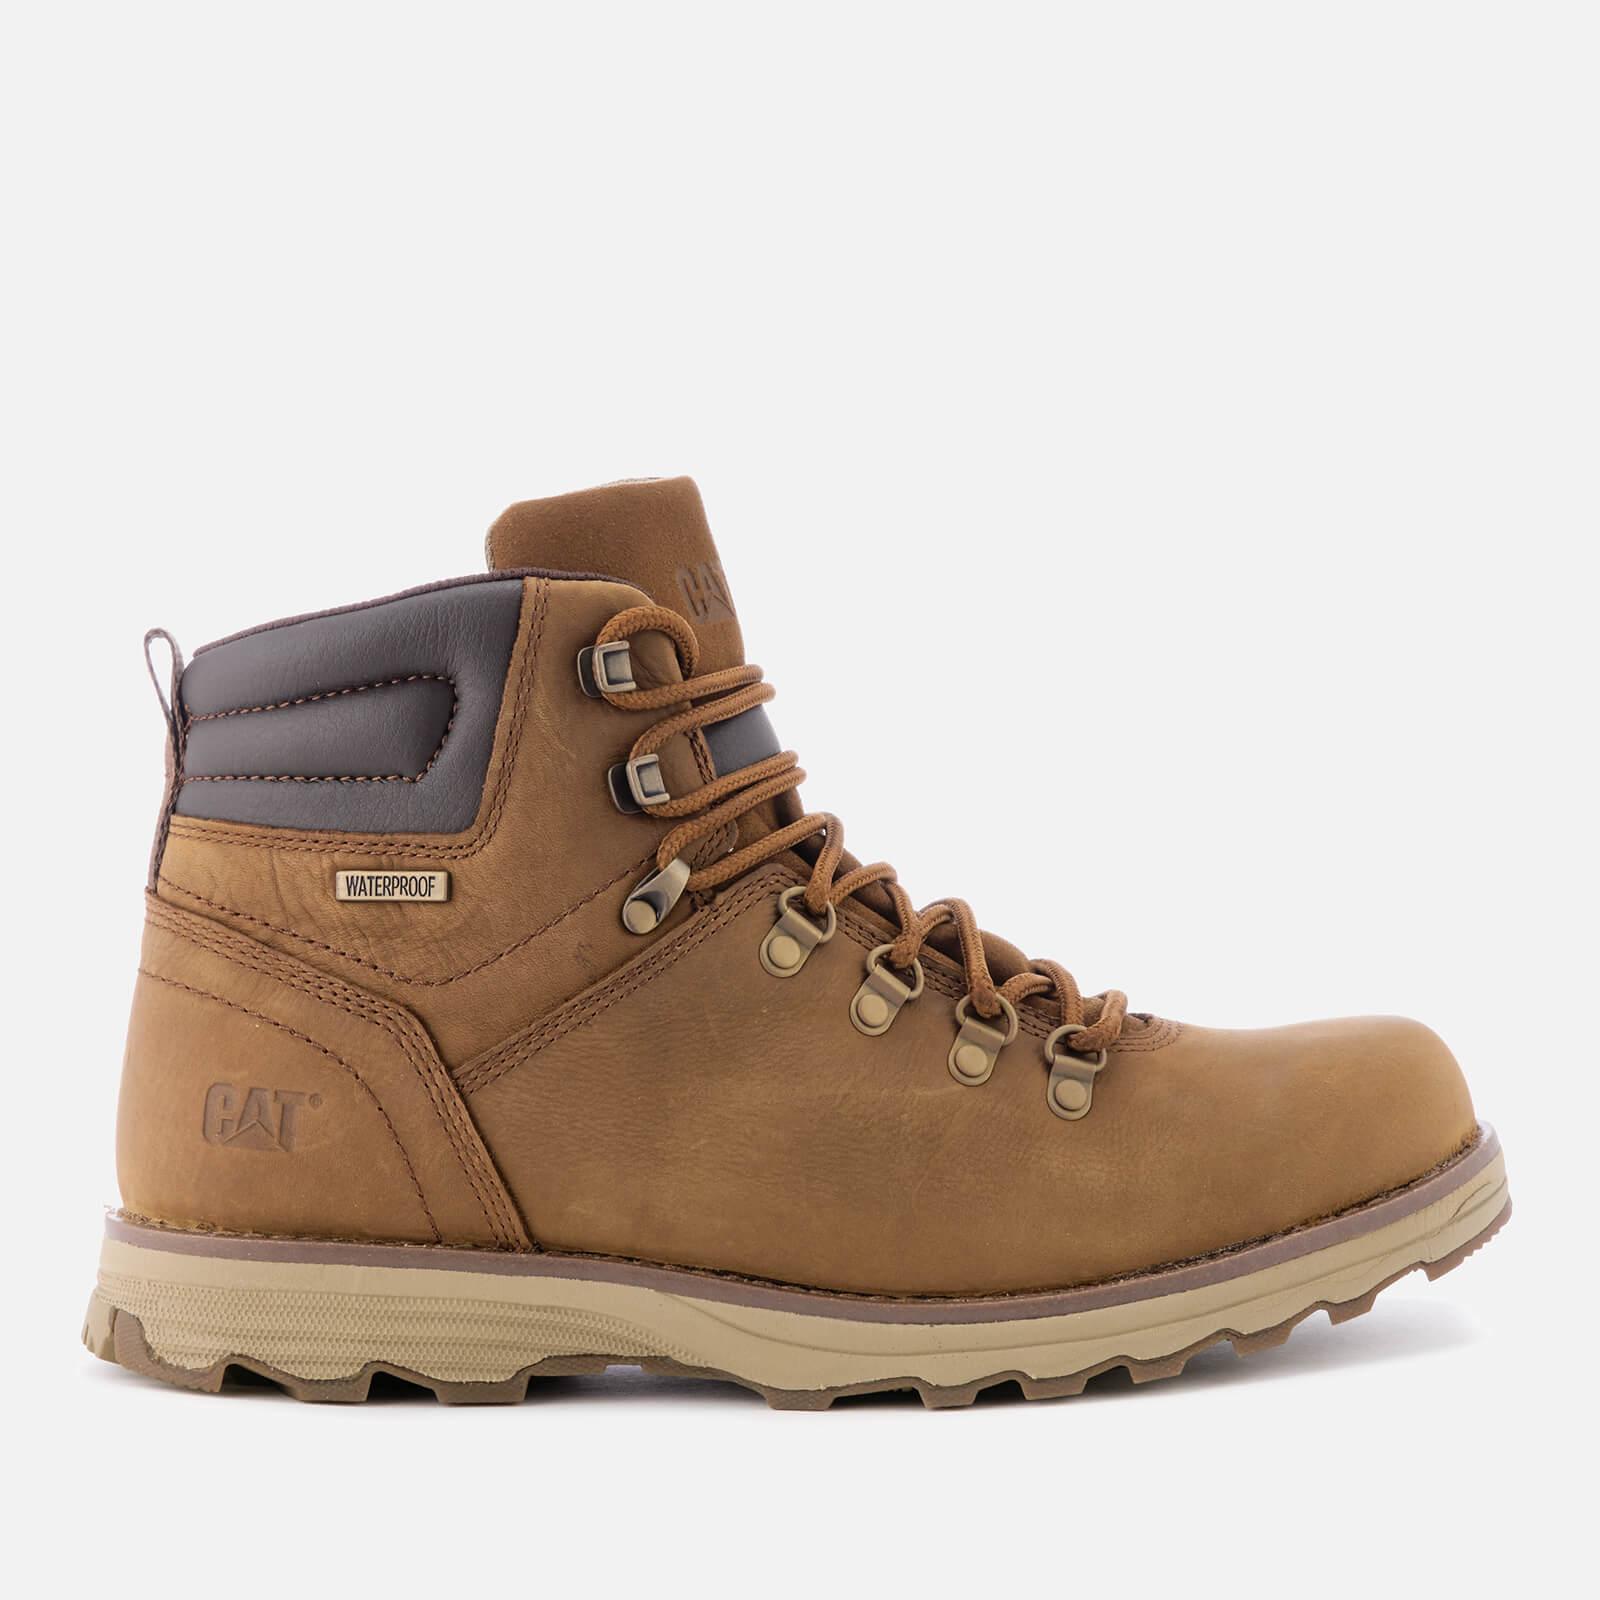 Caterpillar Men's Sire Waterproof Boots - Brown Sugar - UK 7/EU 41 - Brown